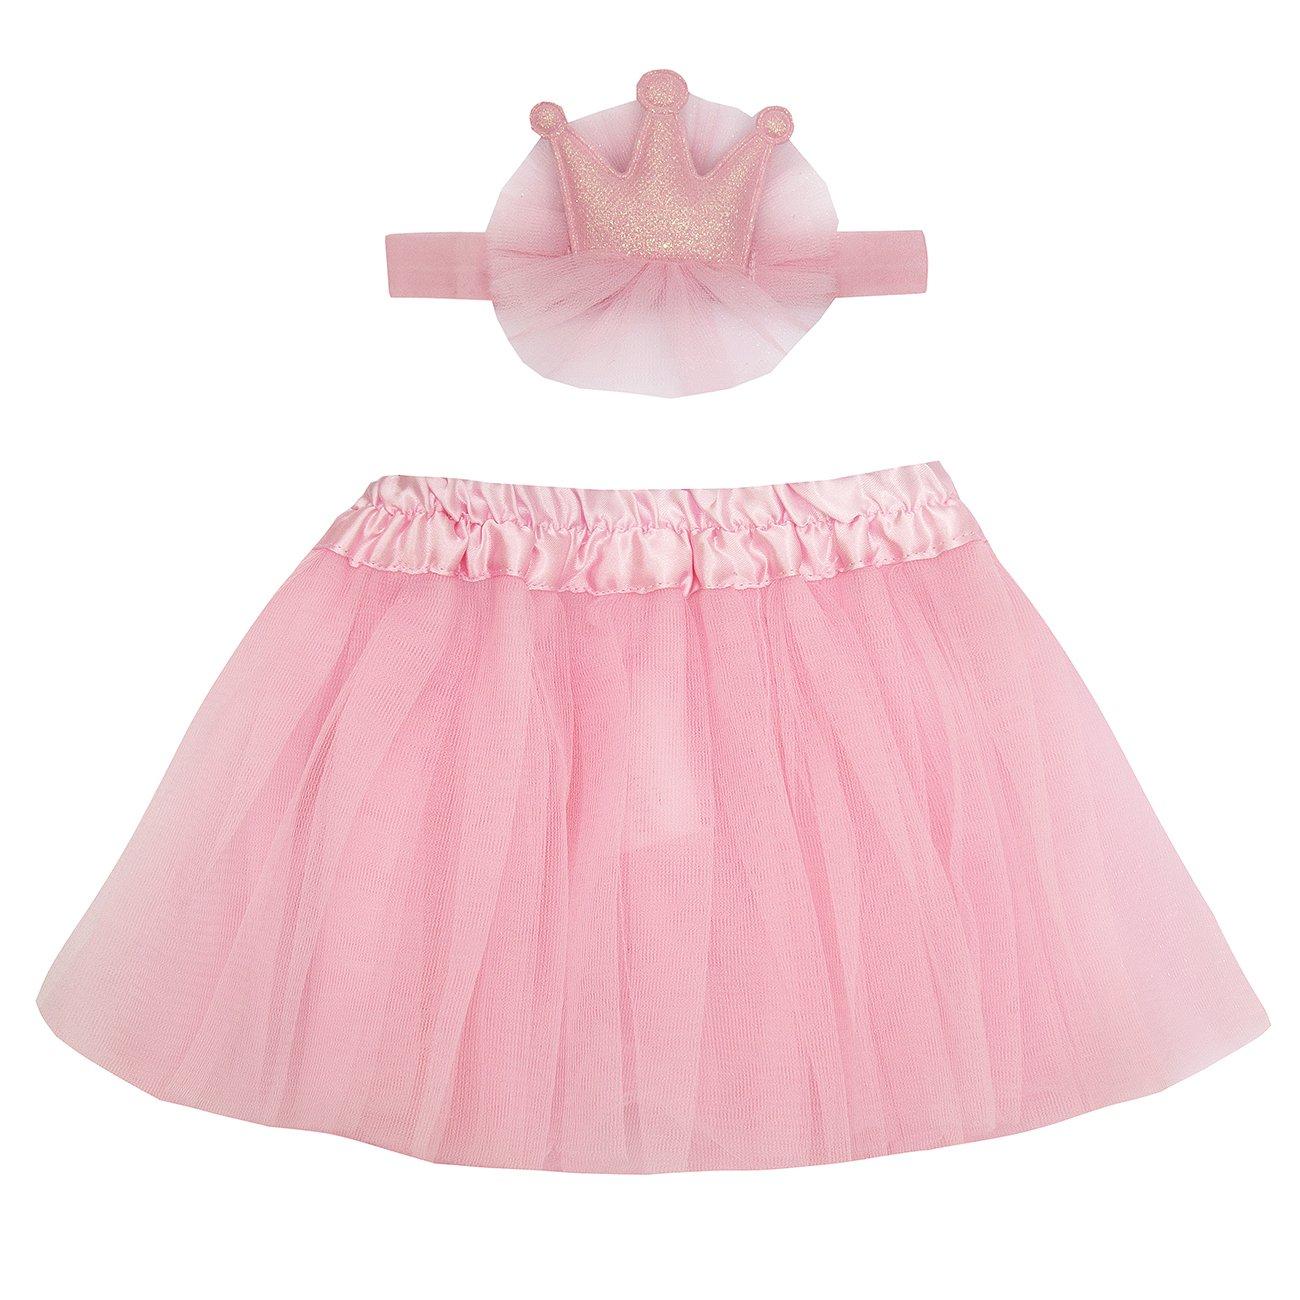 Babytown Baby Girls Tutu & Headband Set (0-24 Months, Pink & White)